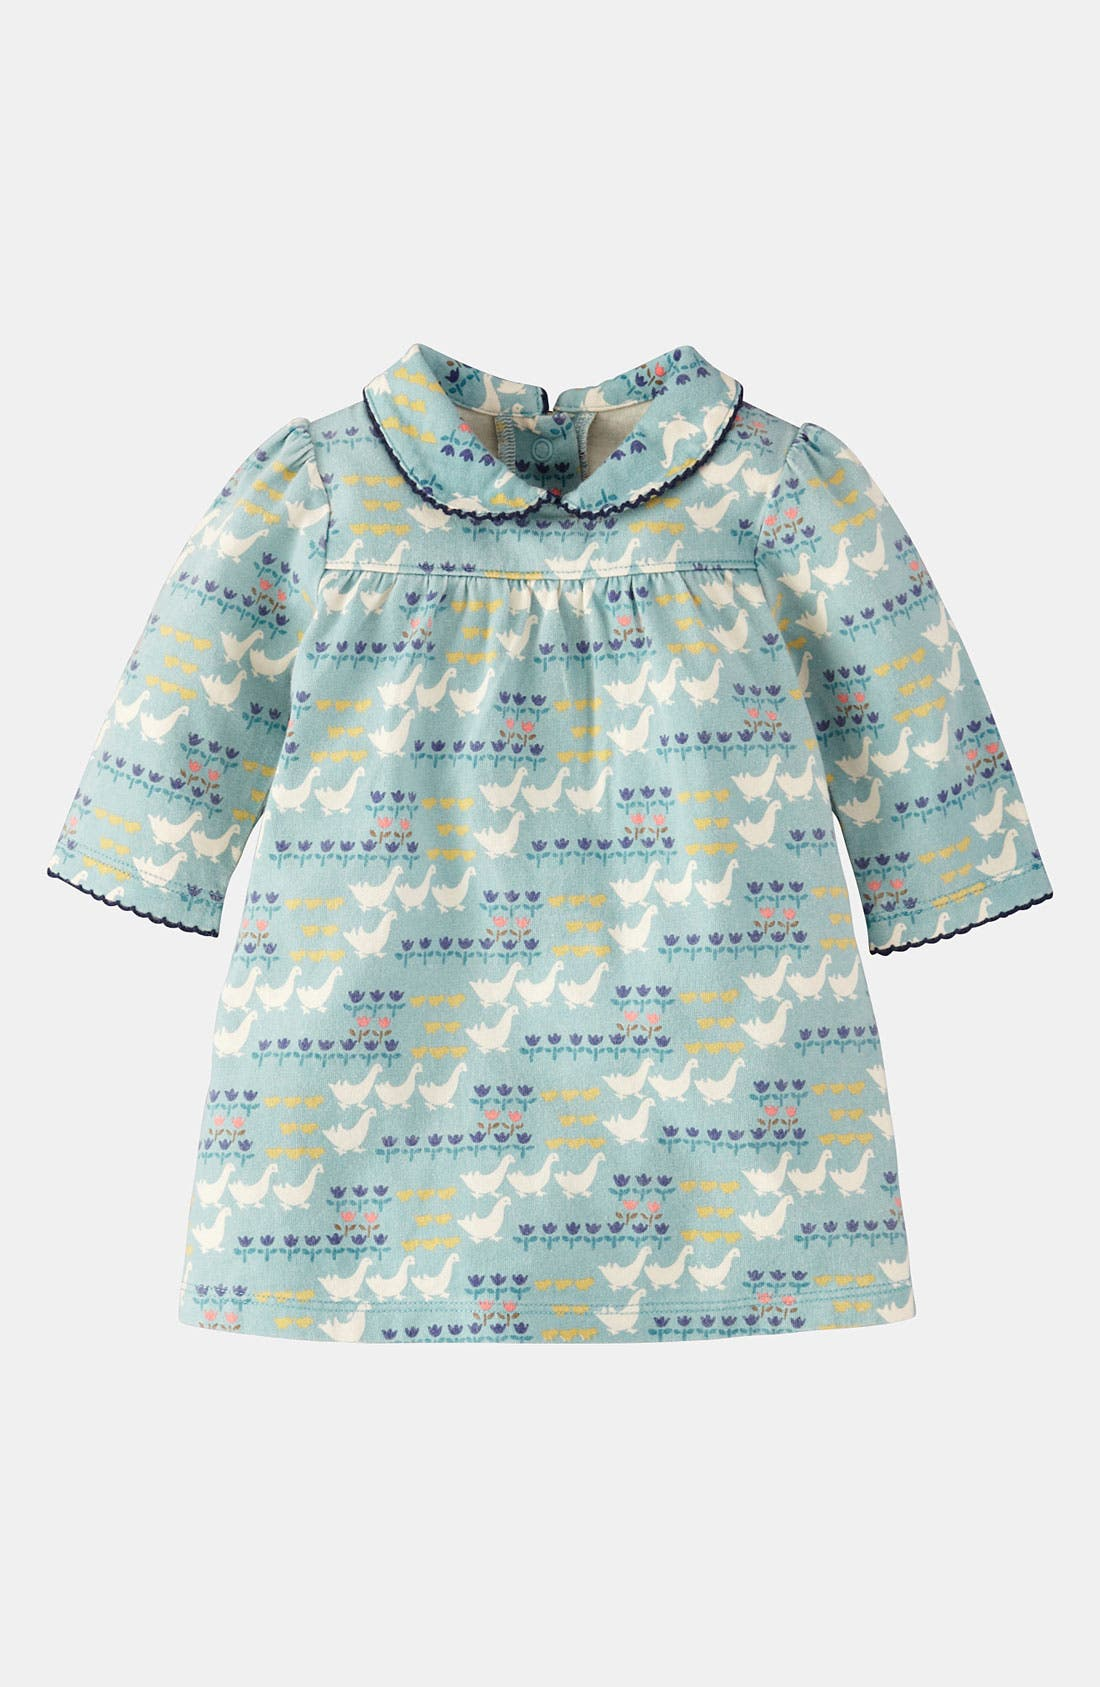 Alternate Image 1 Selected - Mini Boden 'Pretty' Jersey Dress (Infant)